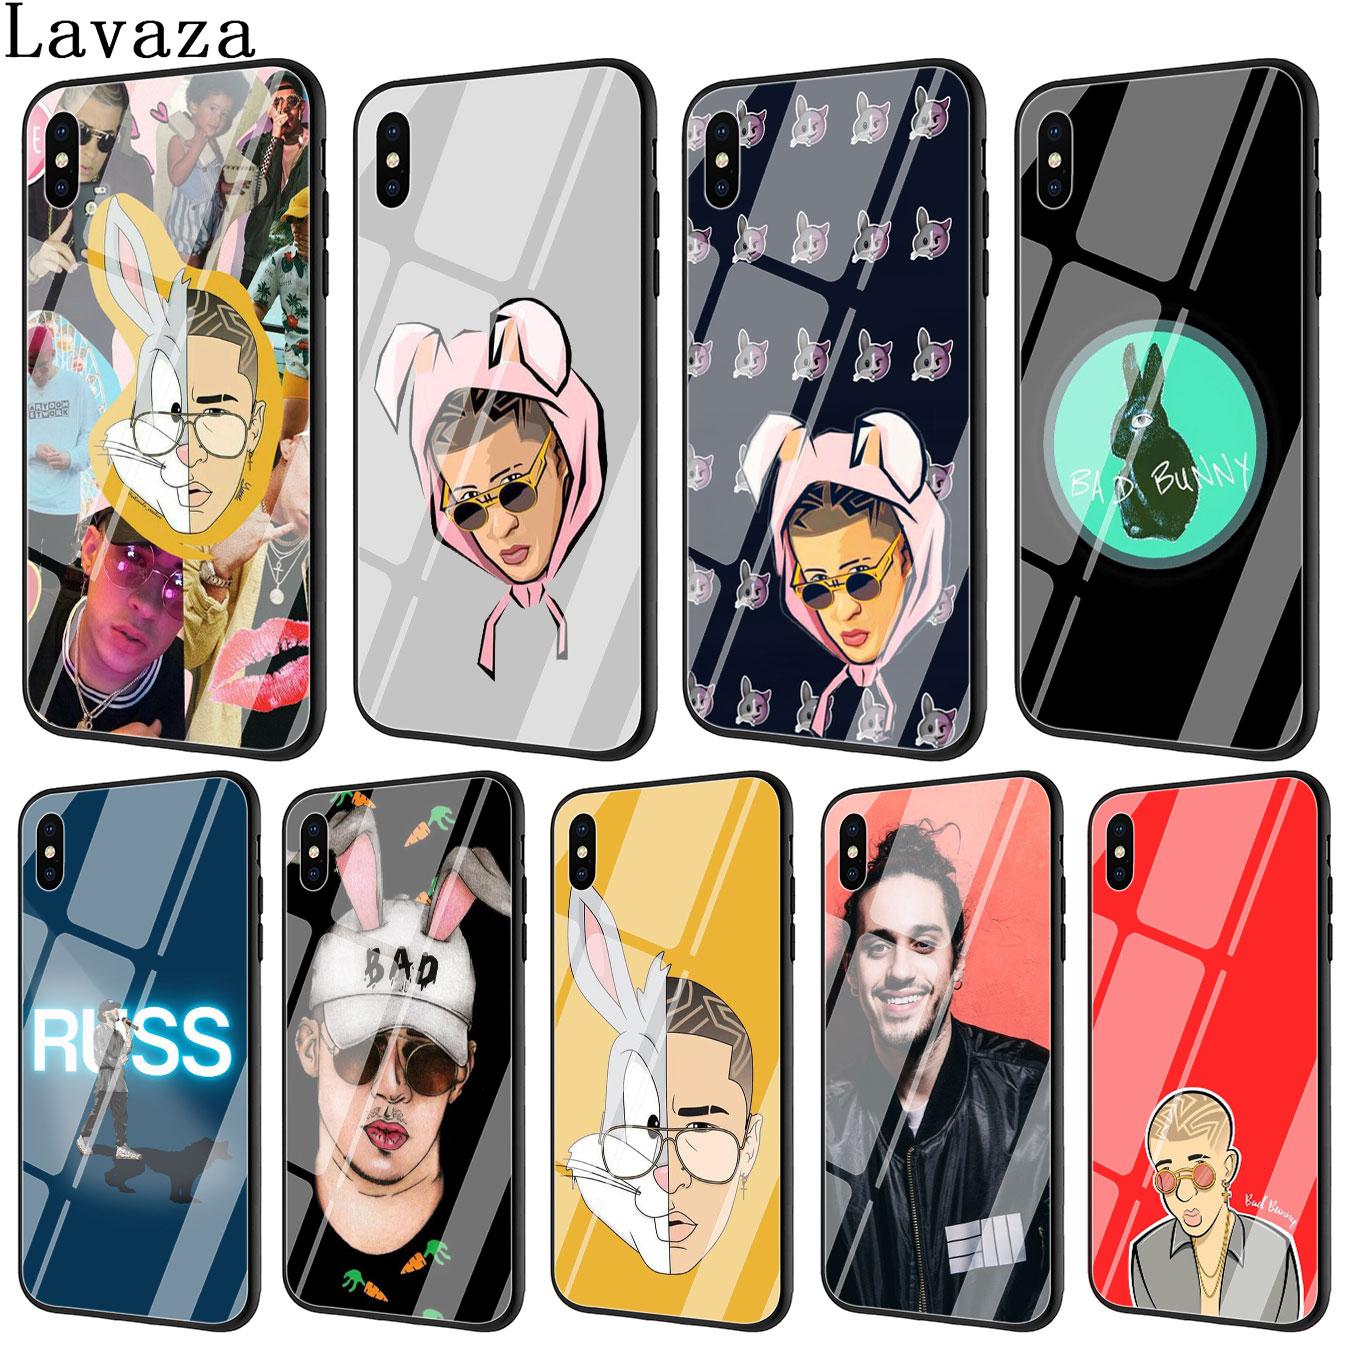 Lavaza Bad Coelho Russ diemon POP Vidro Temperado Caso Tampa Do Telefone para o iPhone Da Apple XR X XS Max 6 6 s 7 8 Plus 5 5S SE 10 Casos